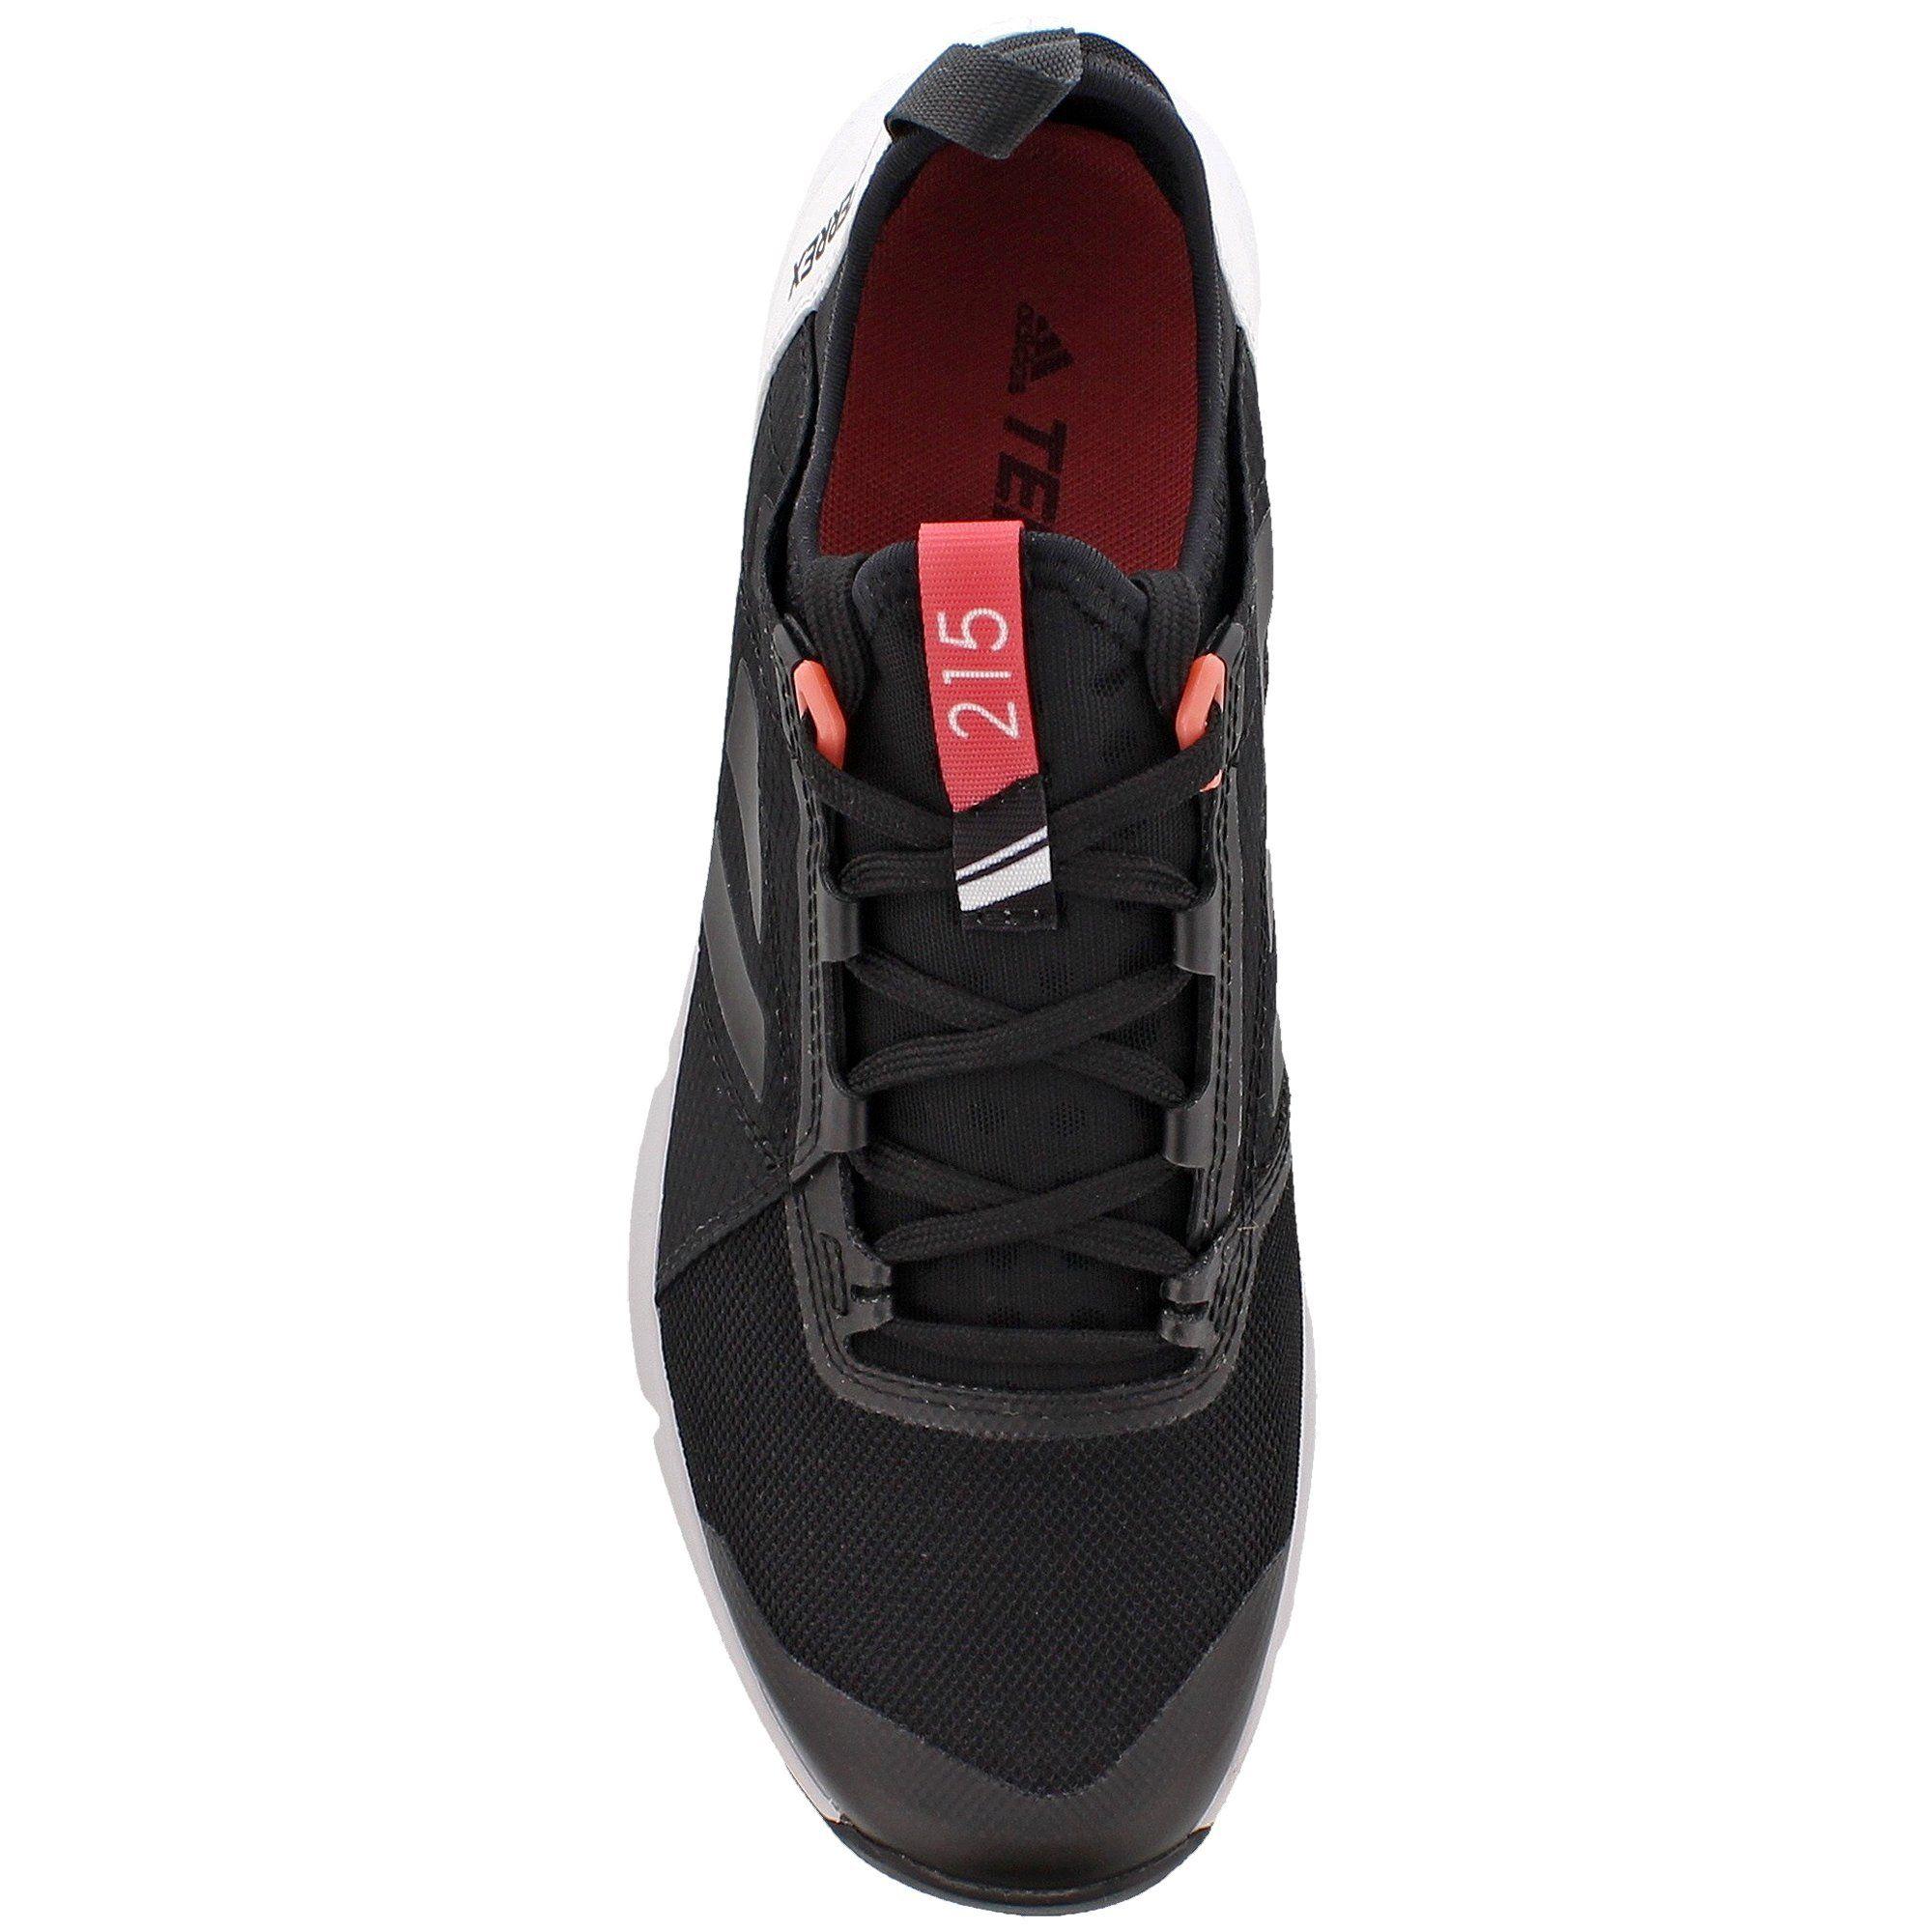 lealtad Instalaciones popular  adidas Terrex Agravic Speed Shoe - Womens Trail Running (9,  Black/Black/White), #Ad #Speed, #Shoe, #Agravic, #adidas in 2020